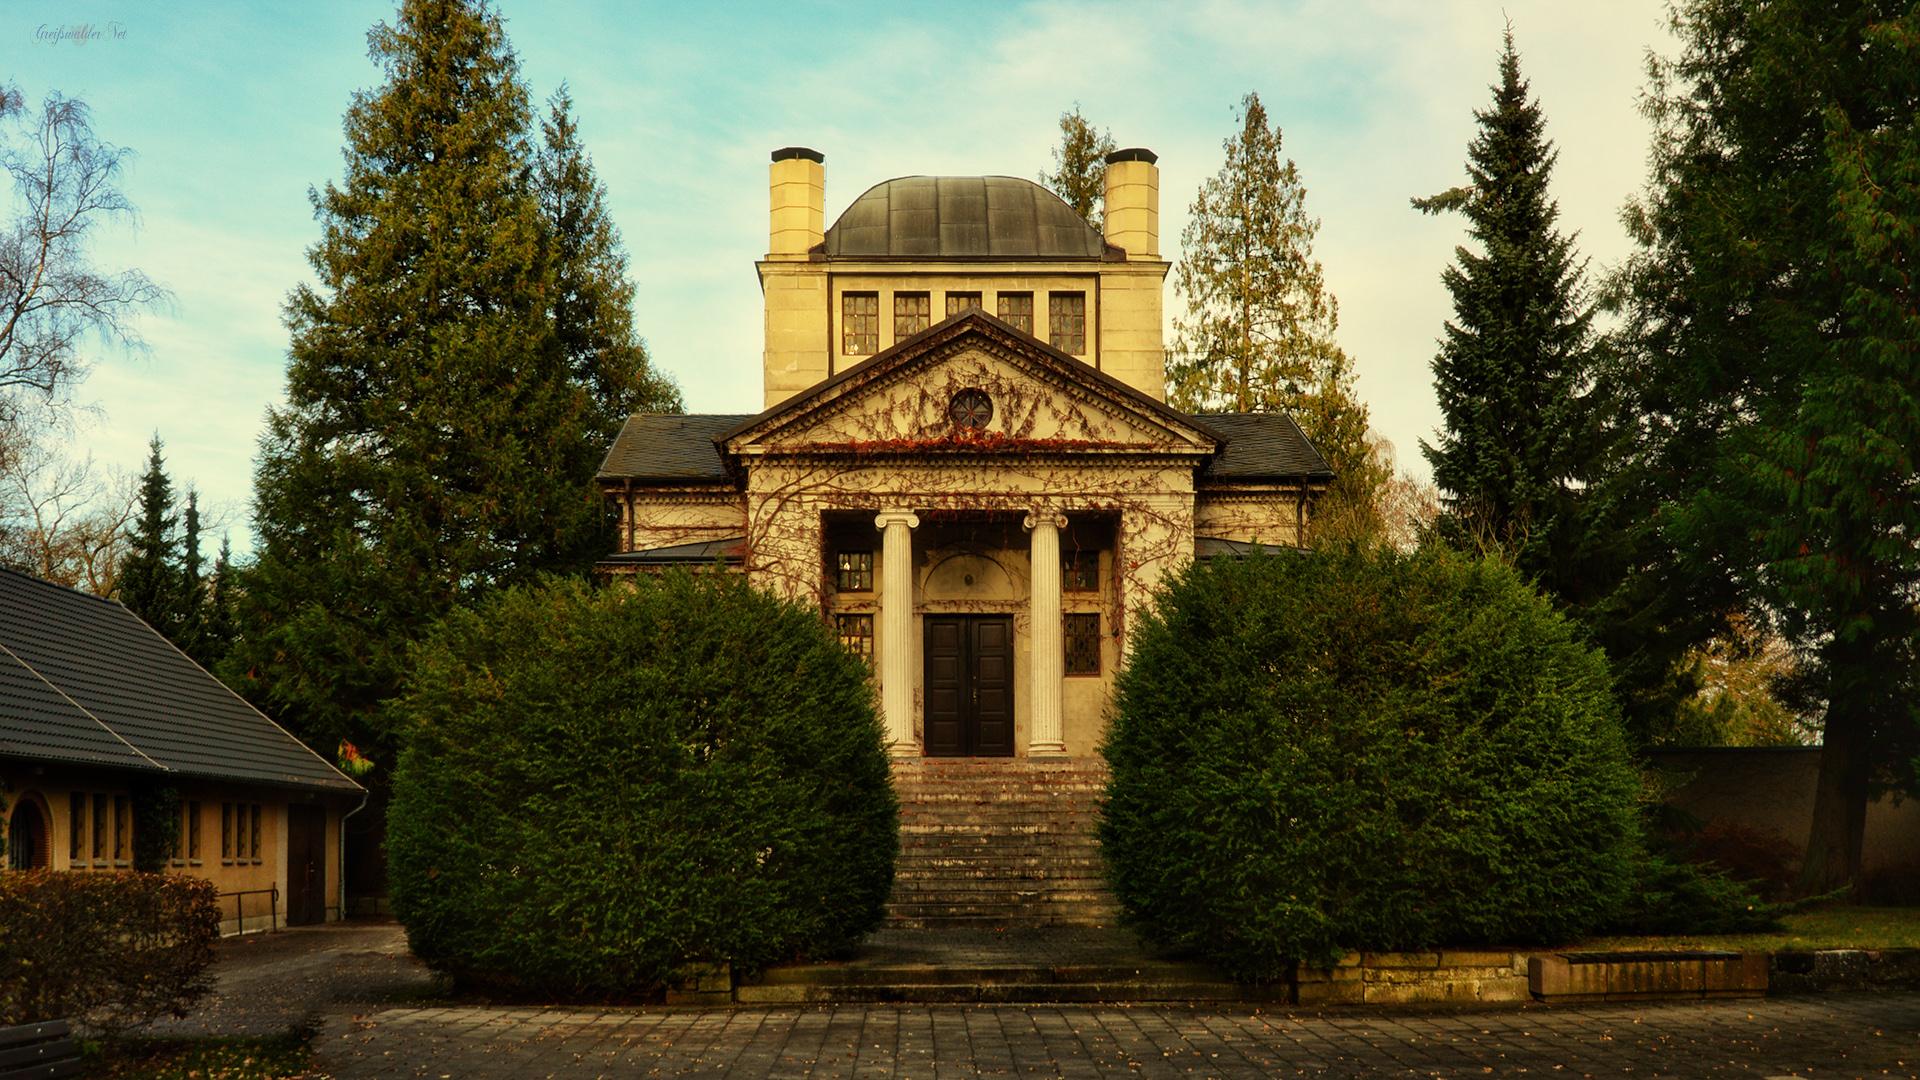 Kapelle - Neuer Friedhof in Greifswald